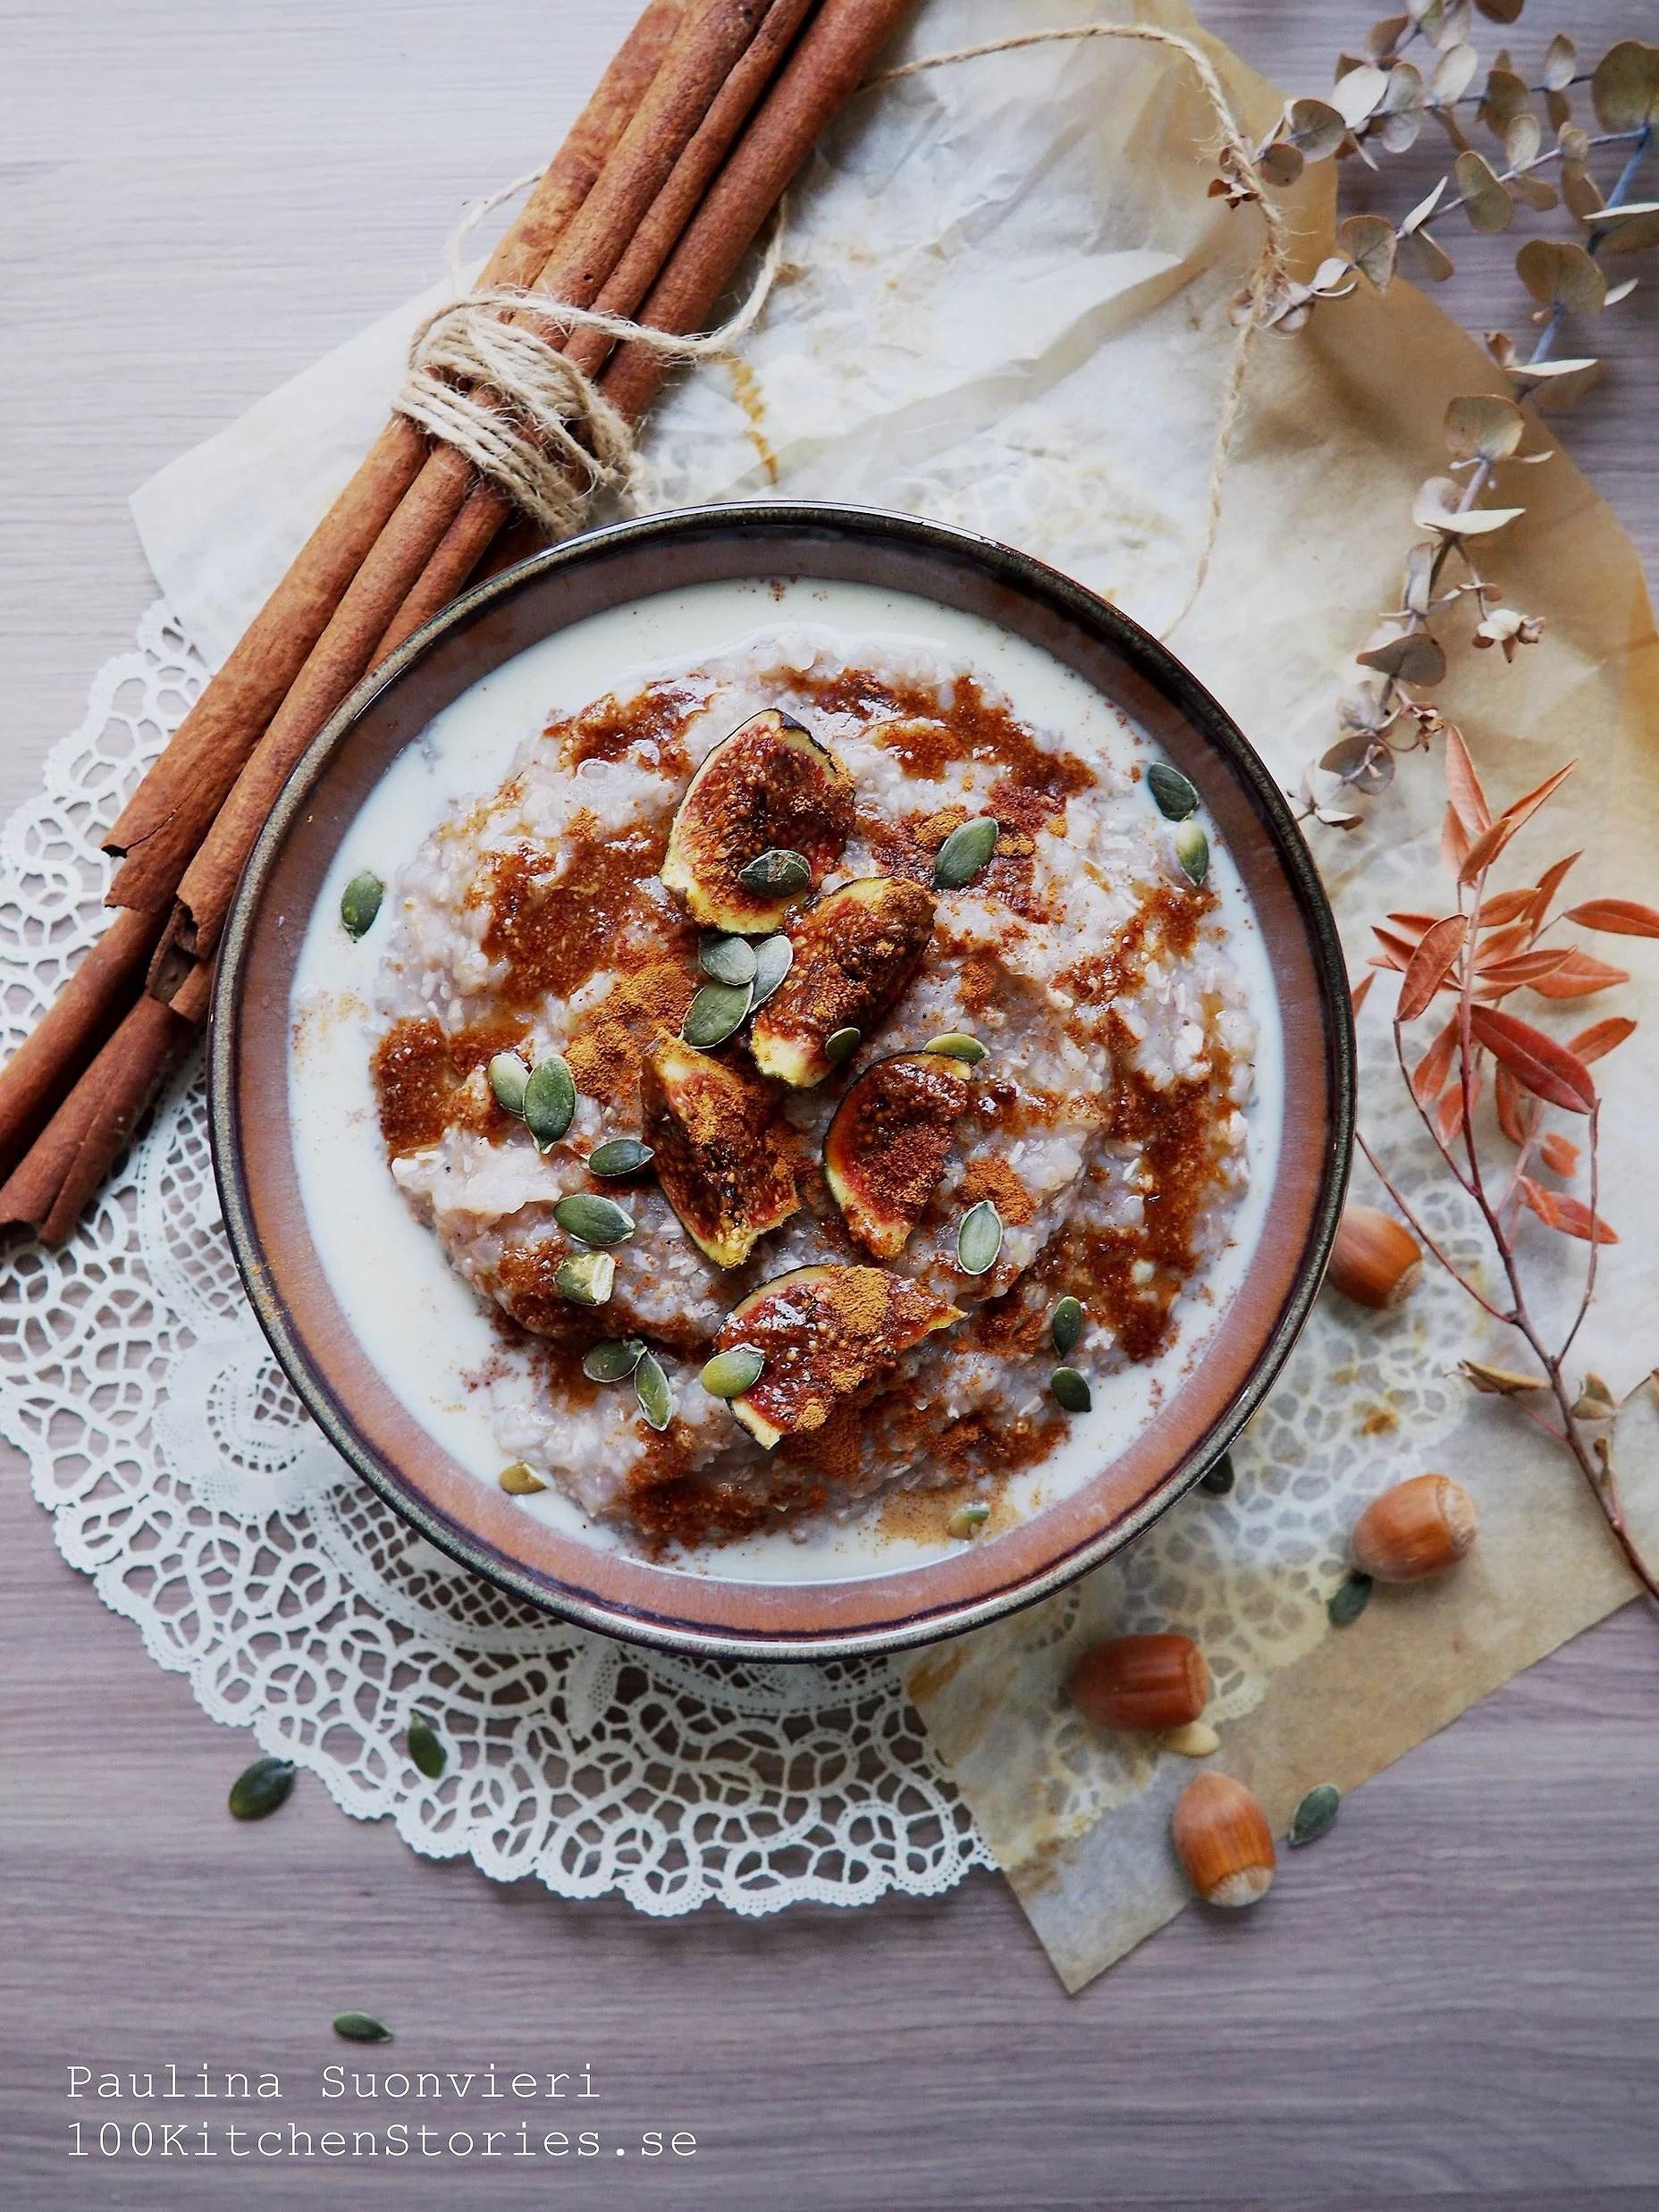 Cinnamon Buckwheat Porridge with Cinnamon Caramel Sauce and Figs